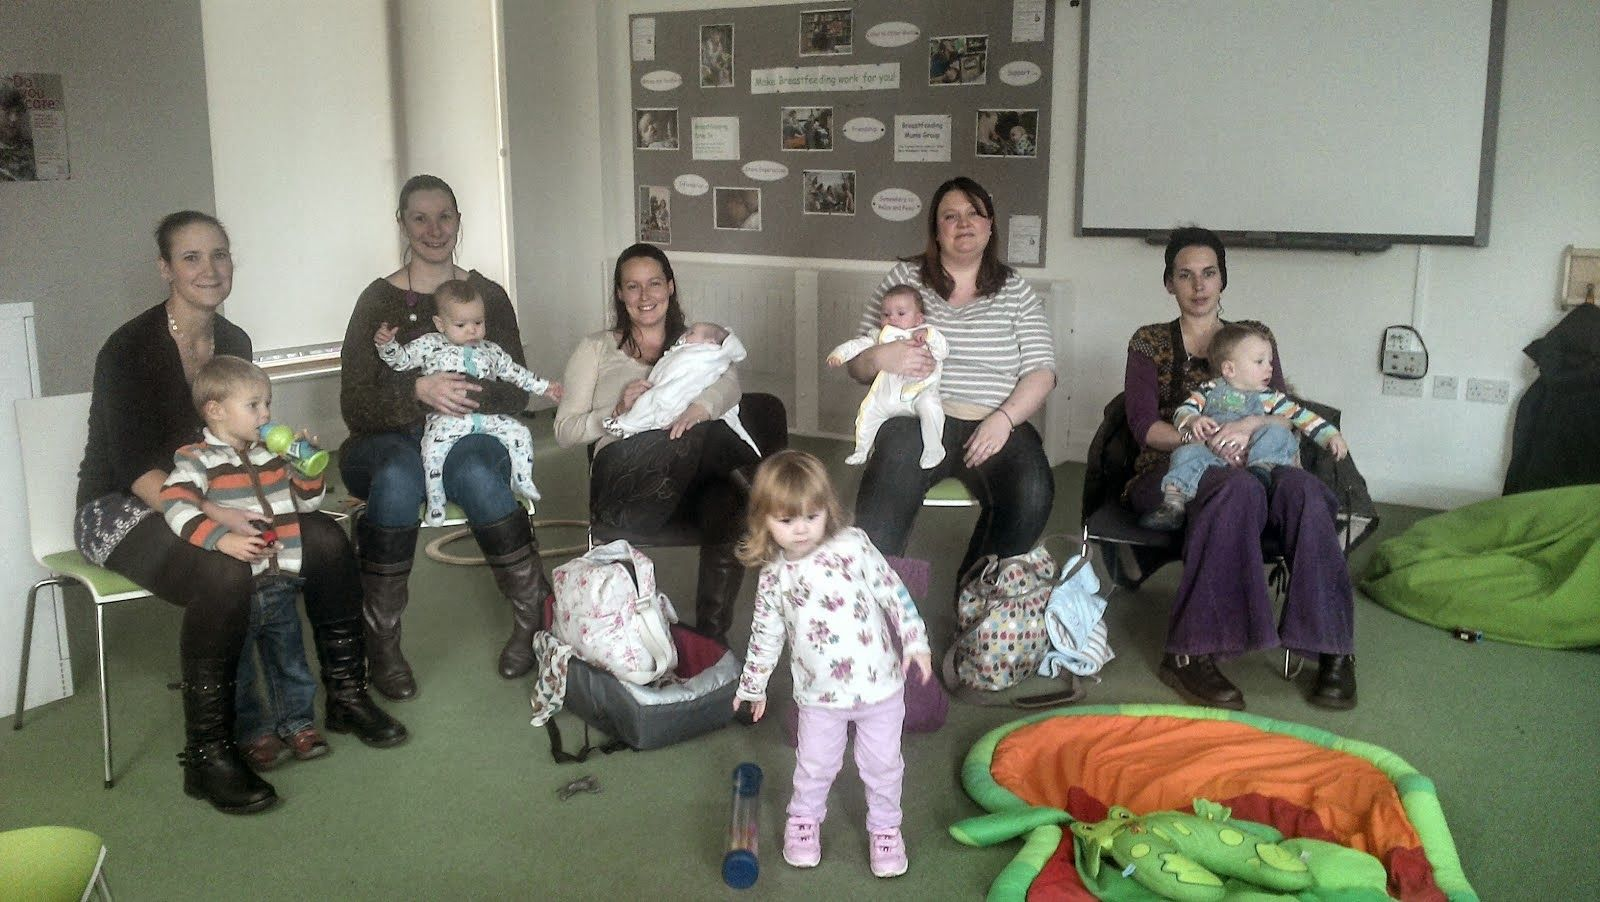 Nancy Mohrbacher's Breastfeeding Solutions app